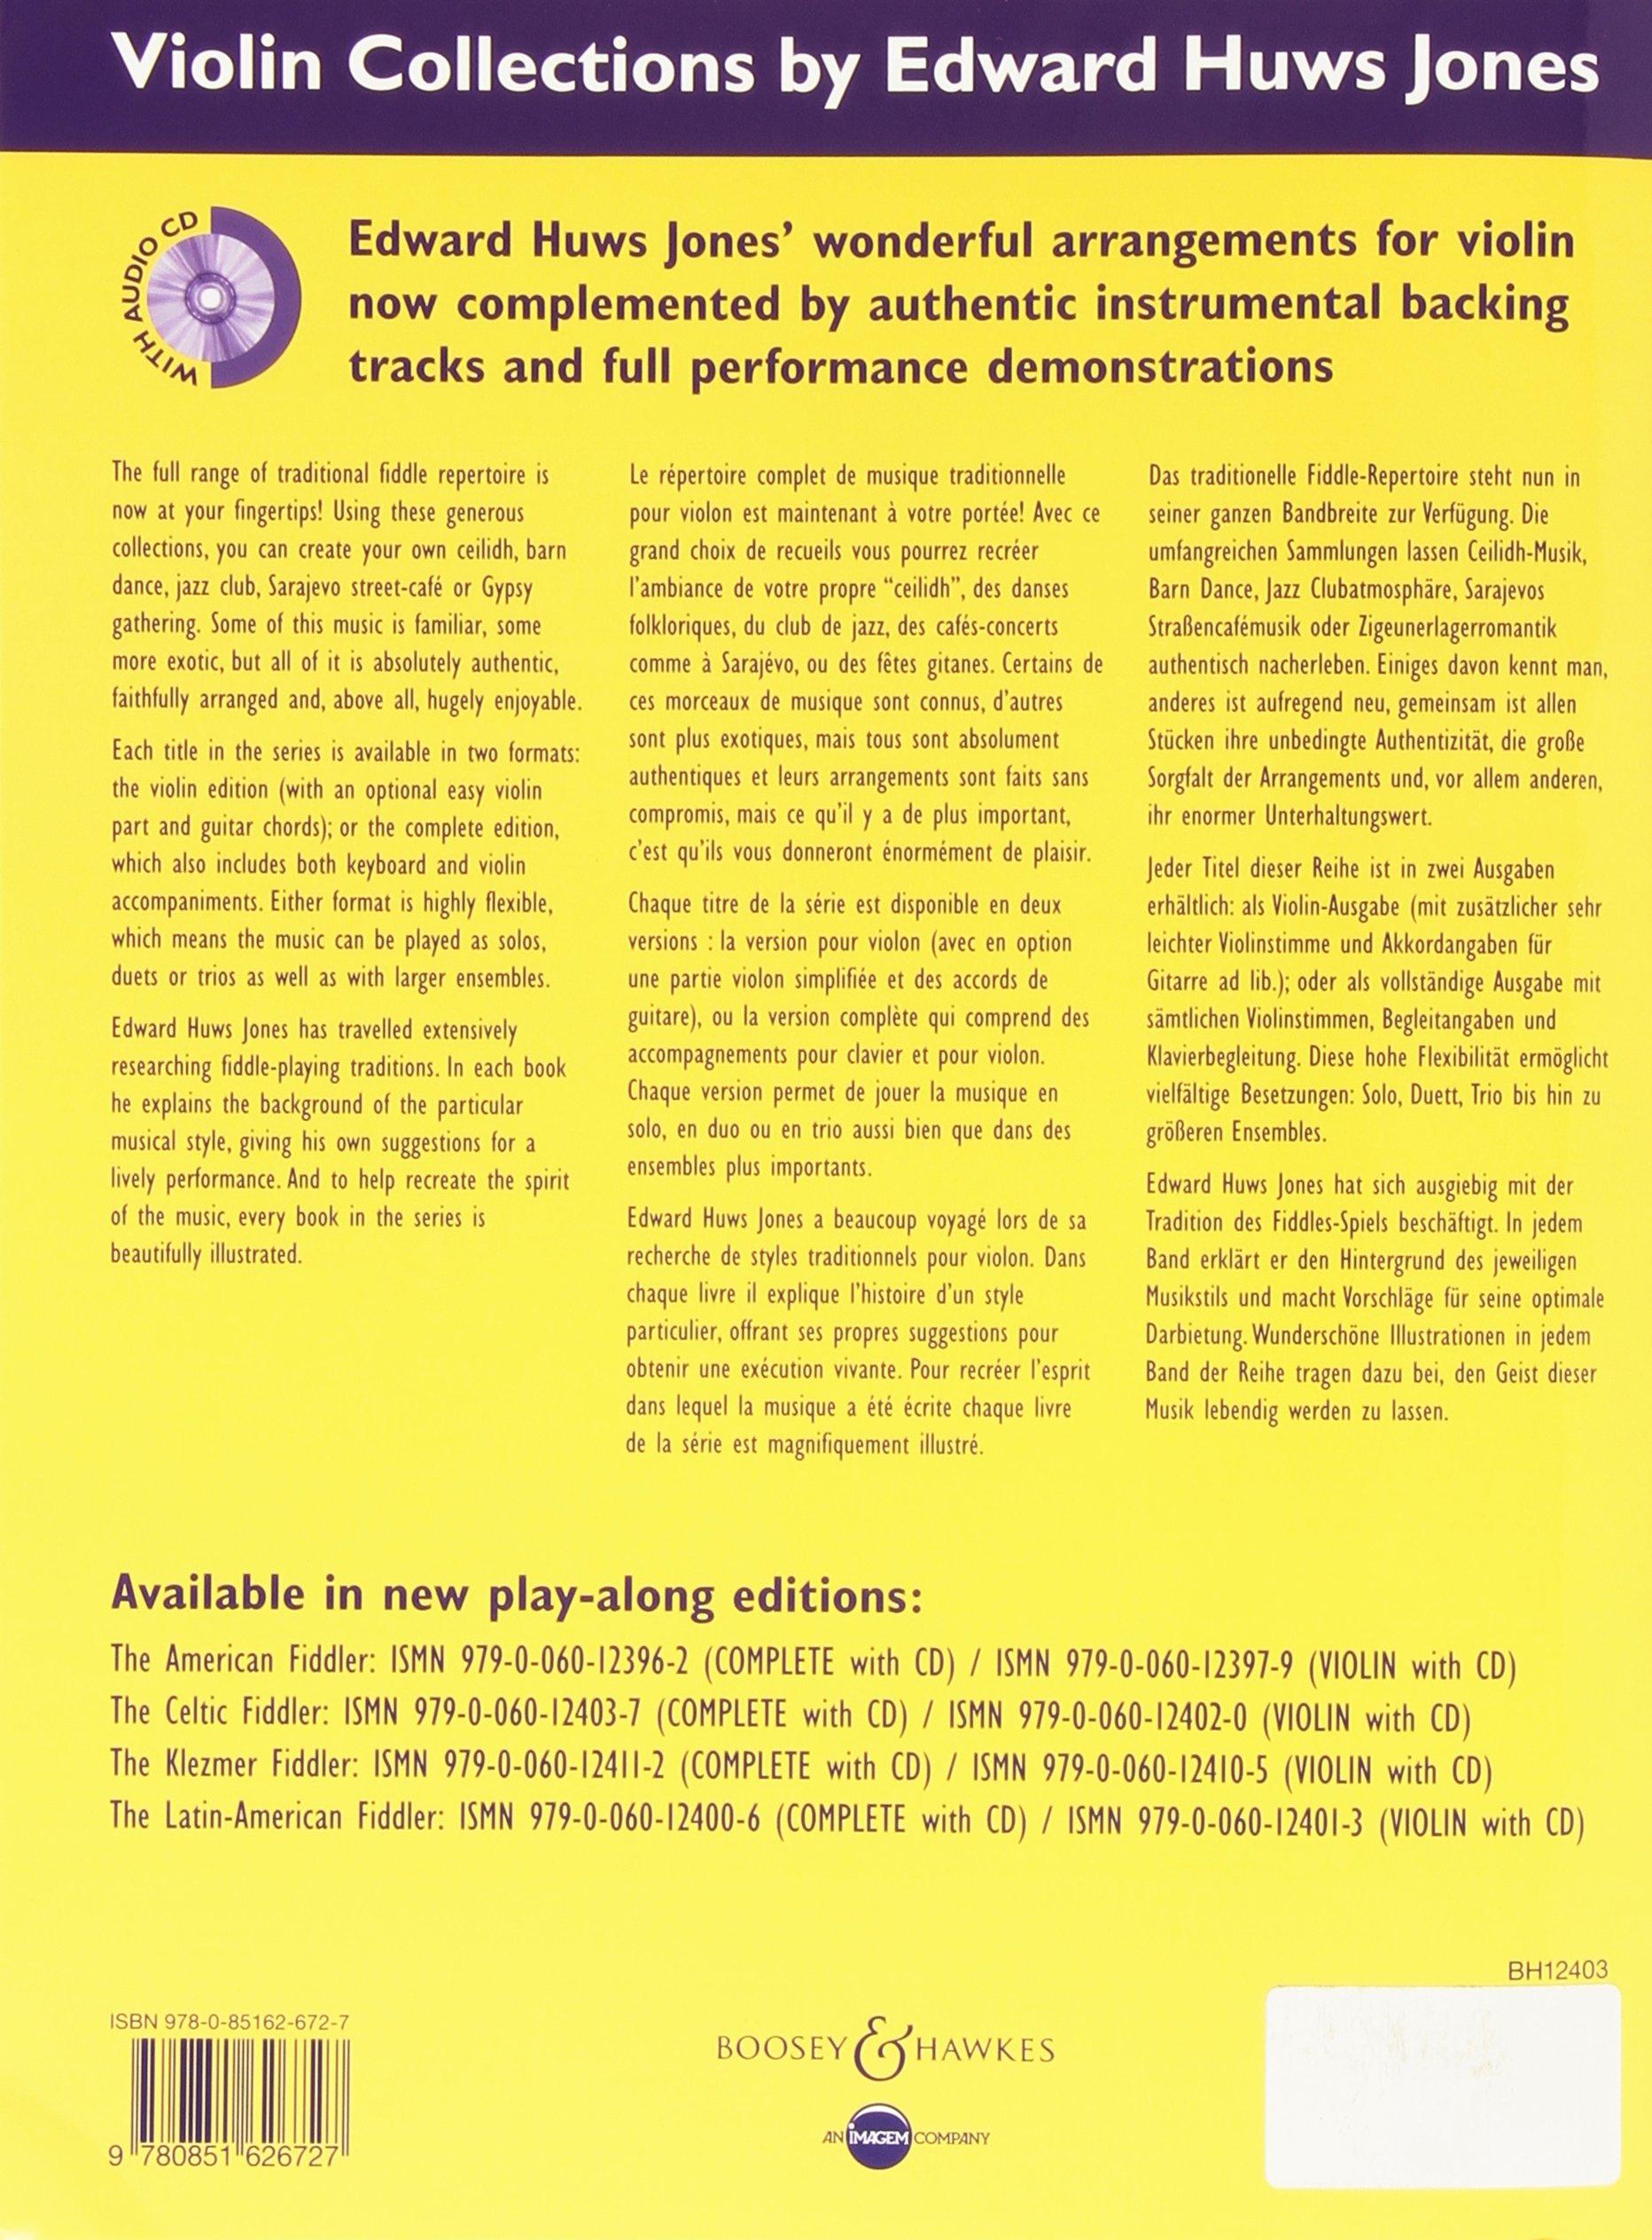 CELTIC FIDDLER Huws Jones VIOLIN CD